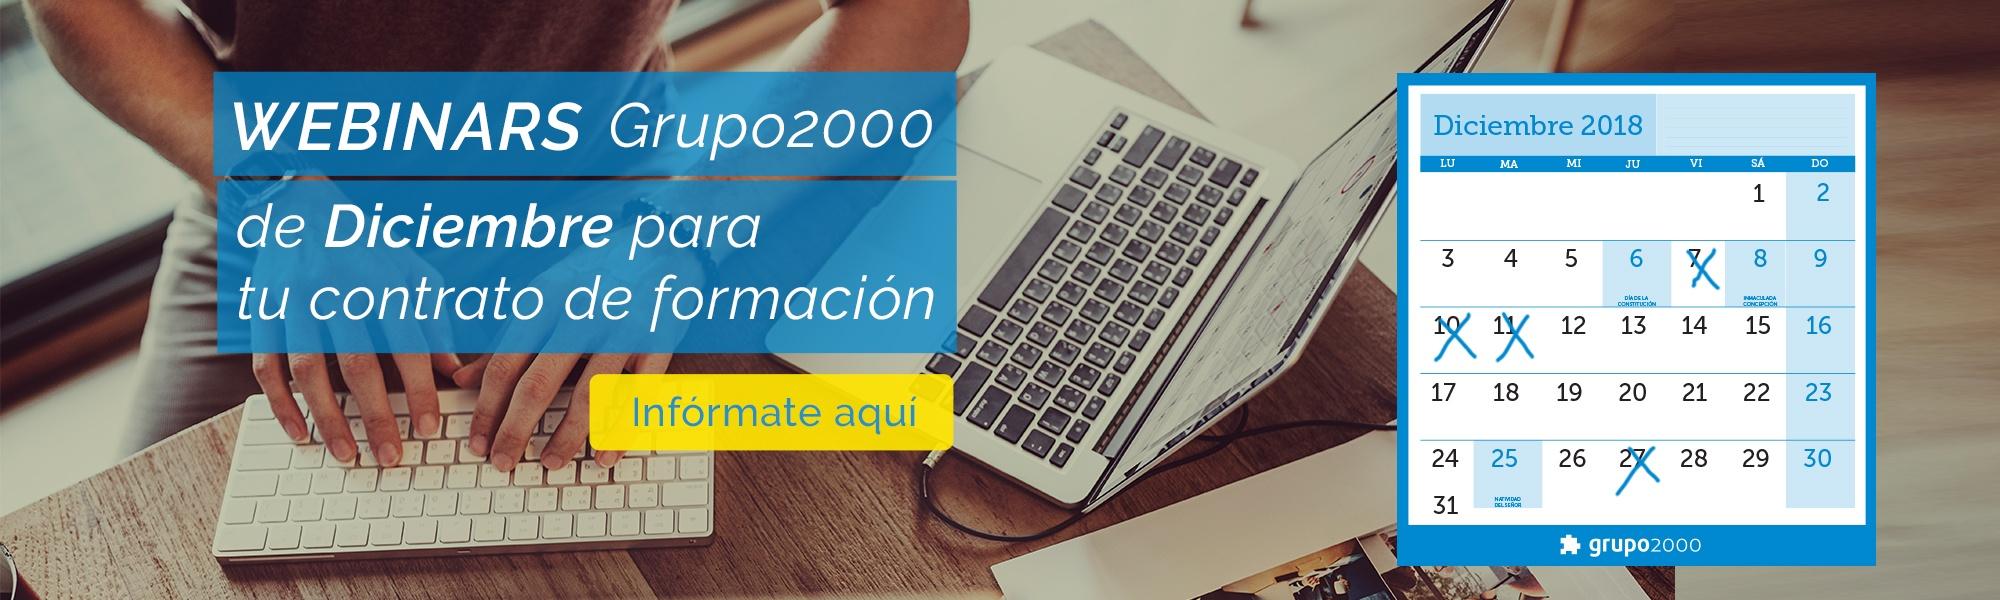 Nuevos webinars Grupo2000